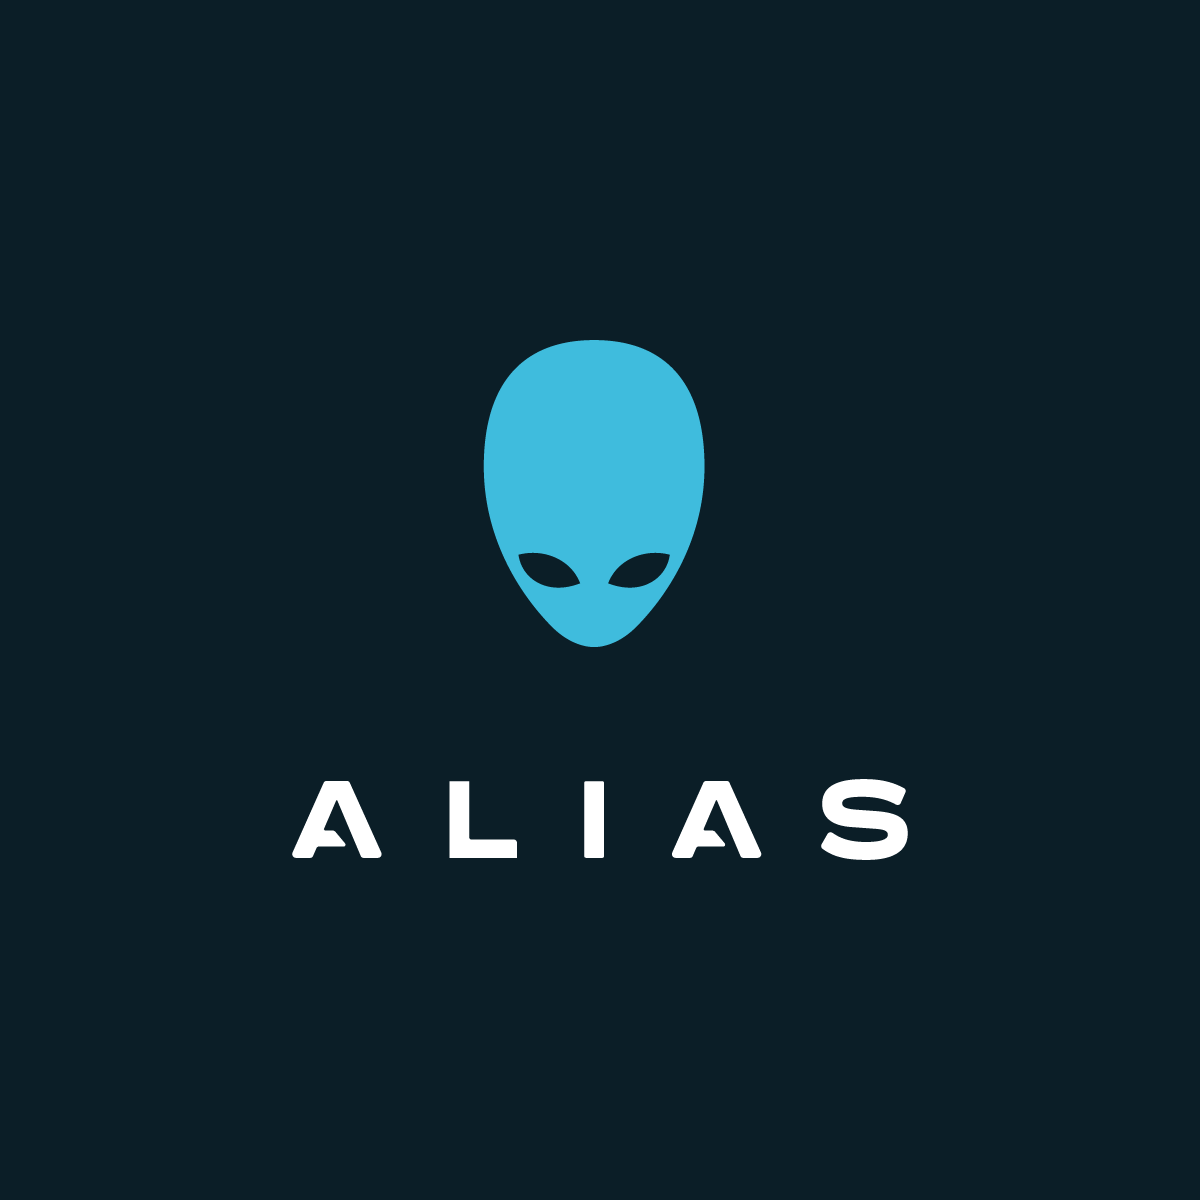 Alias_Profile-01.png